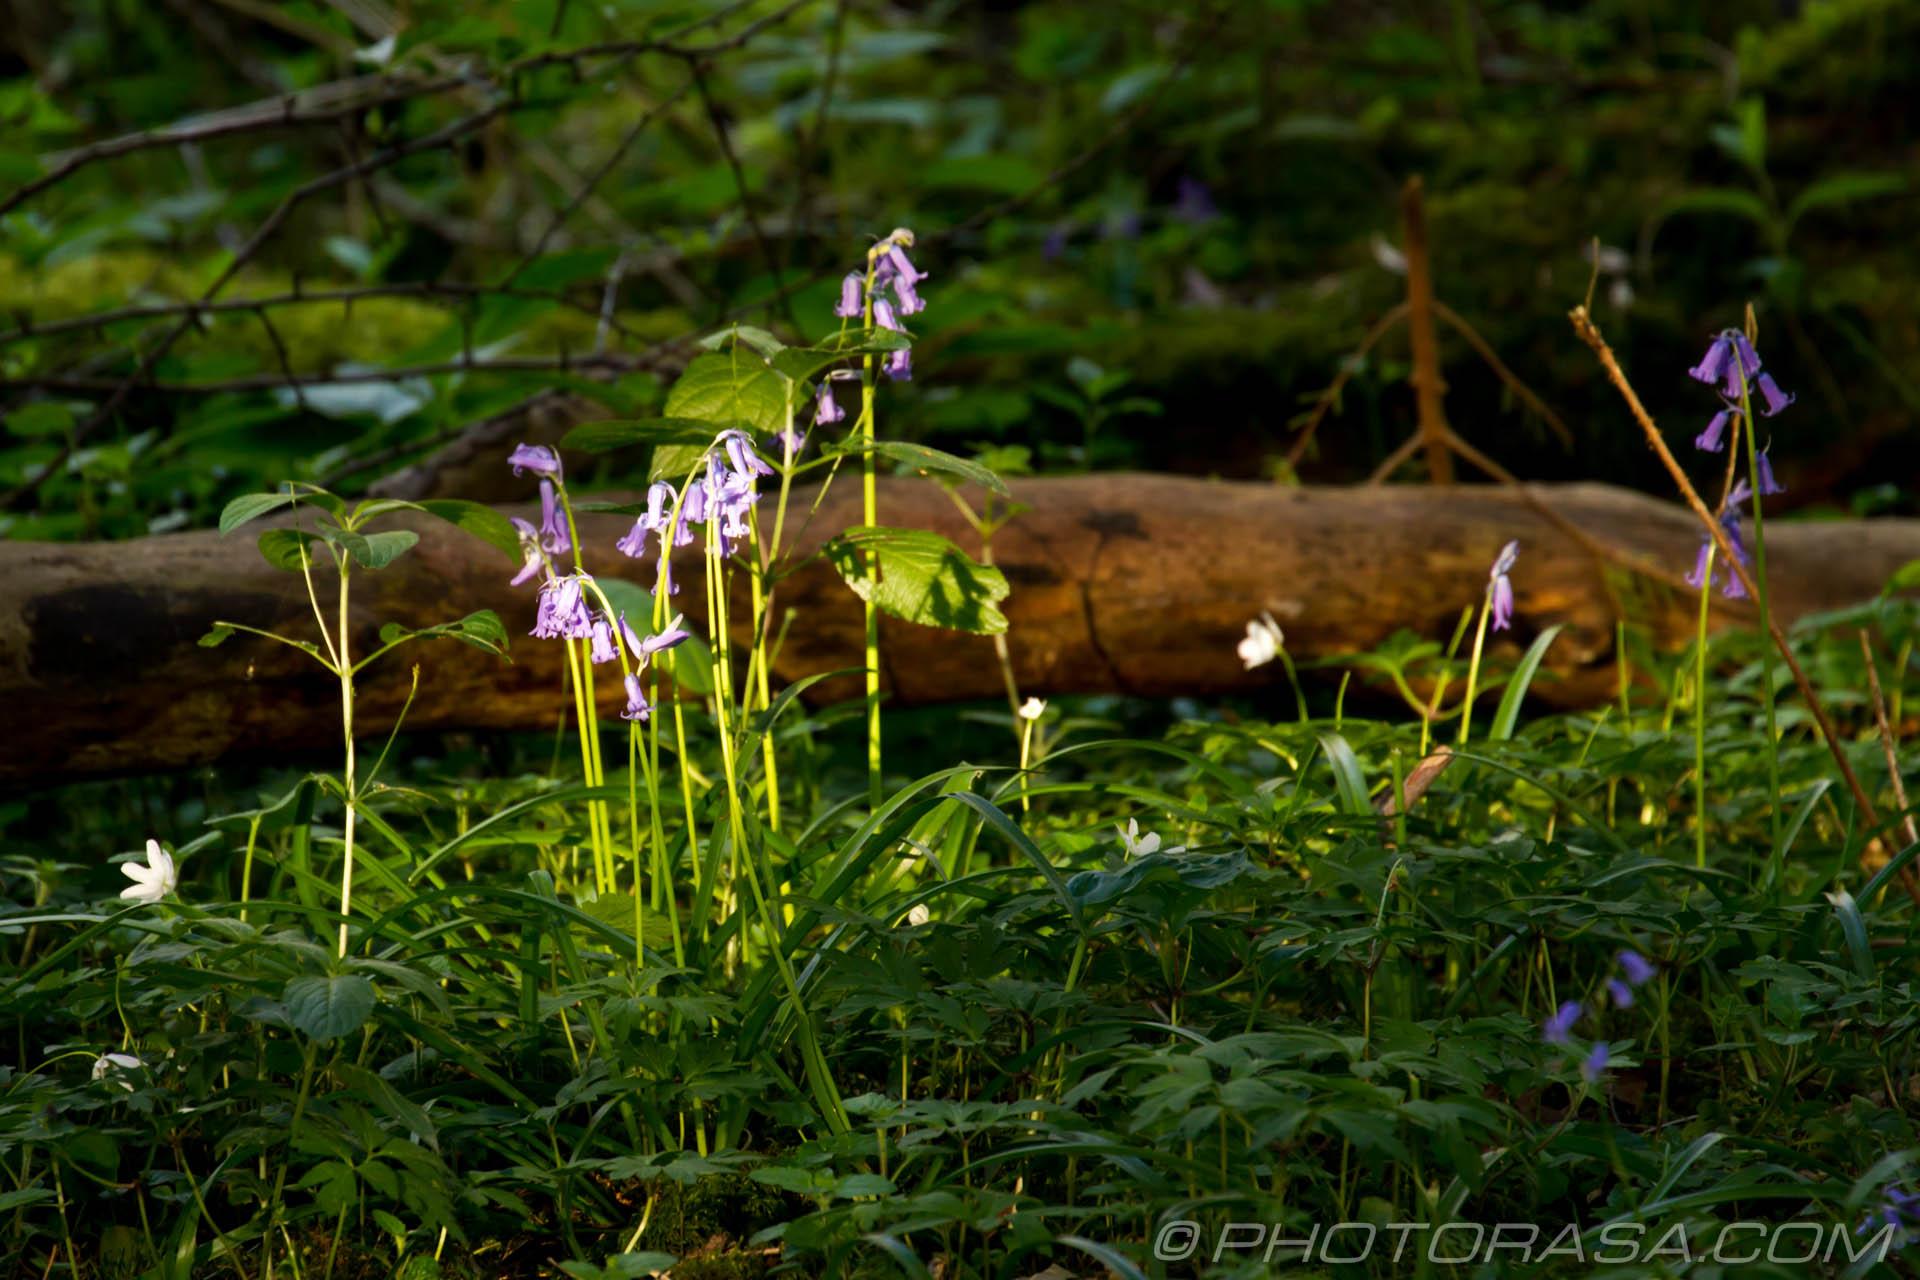 http://photorasa.com/bluebells-woods/sunlit-bluebells/